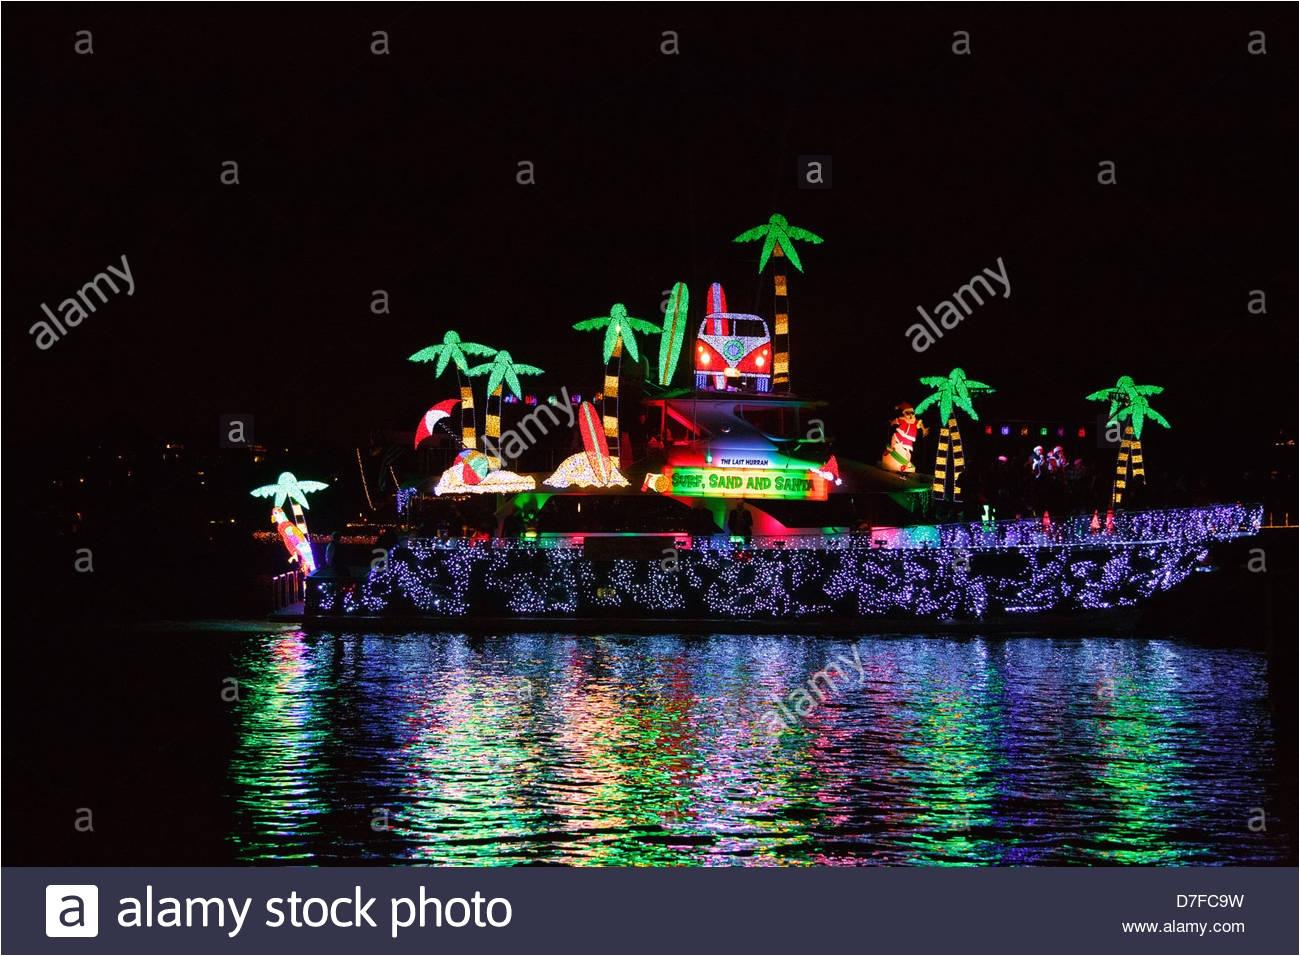 Newport Beach Christmas Lights Cruise.Newport Beach Christmas Lights Cruise Christmas Boat Stock